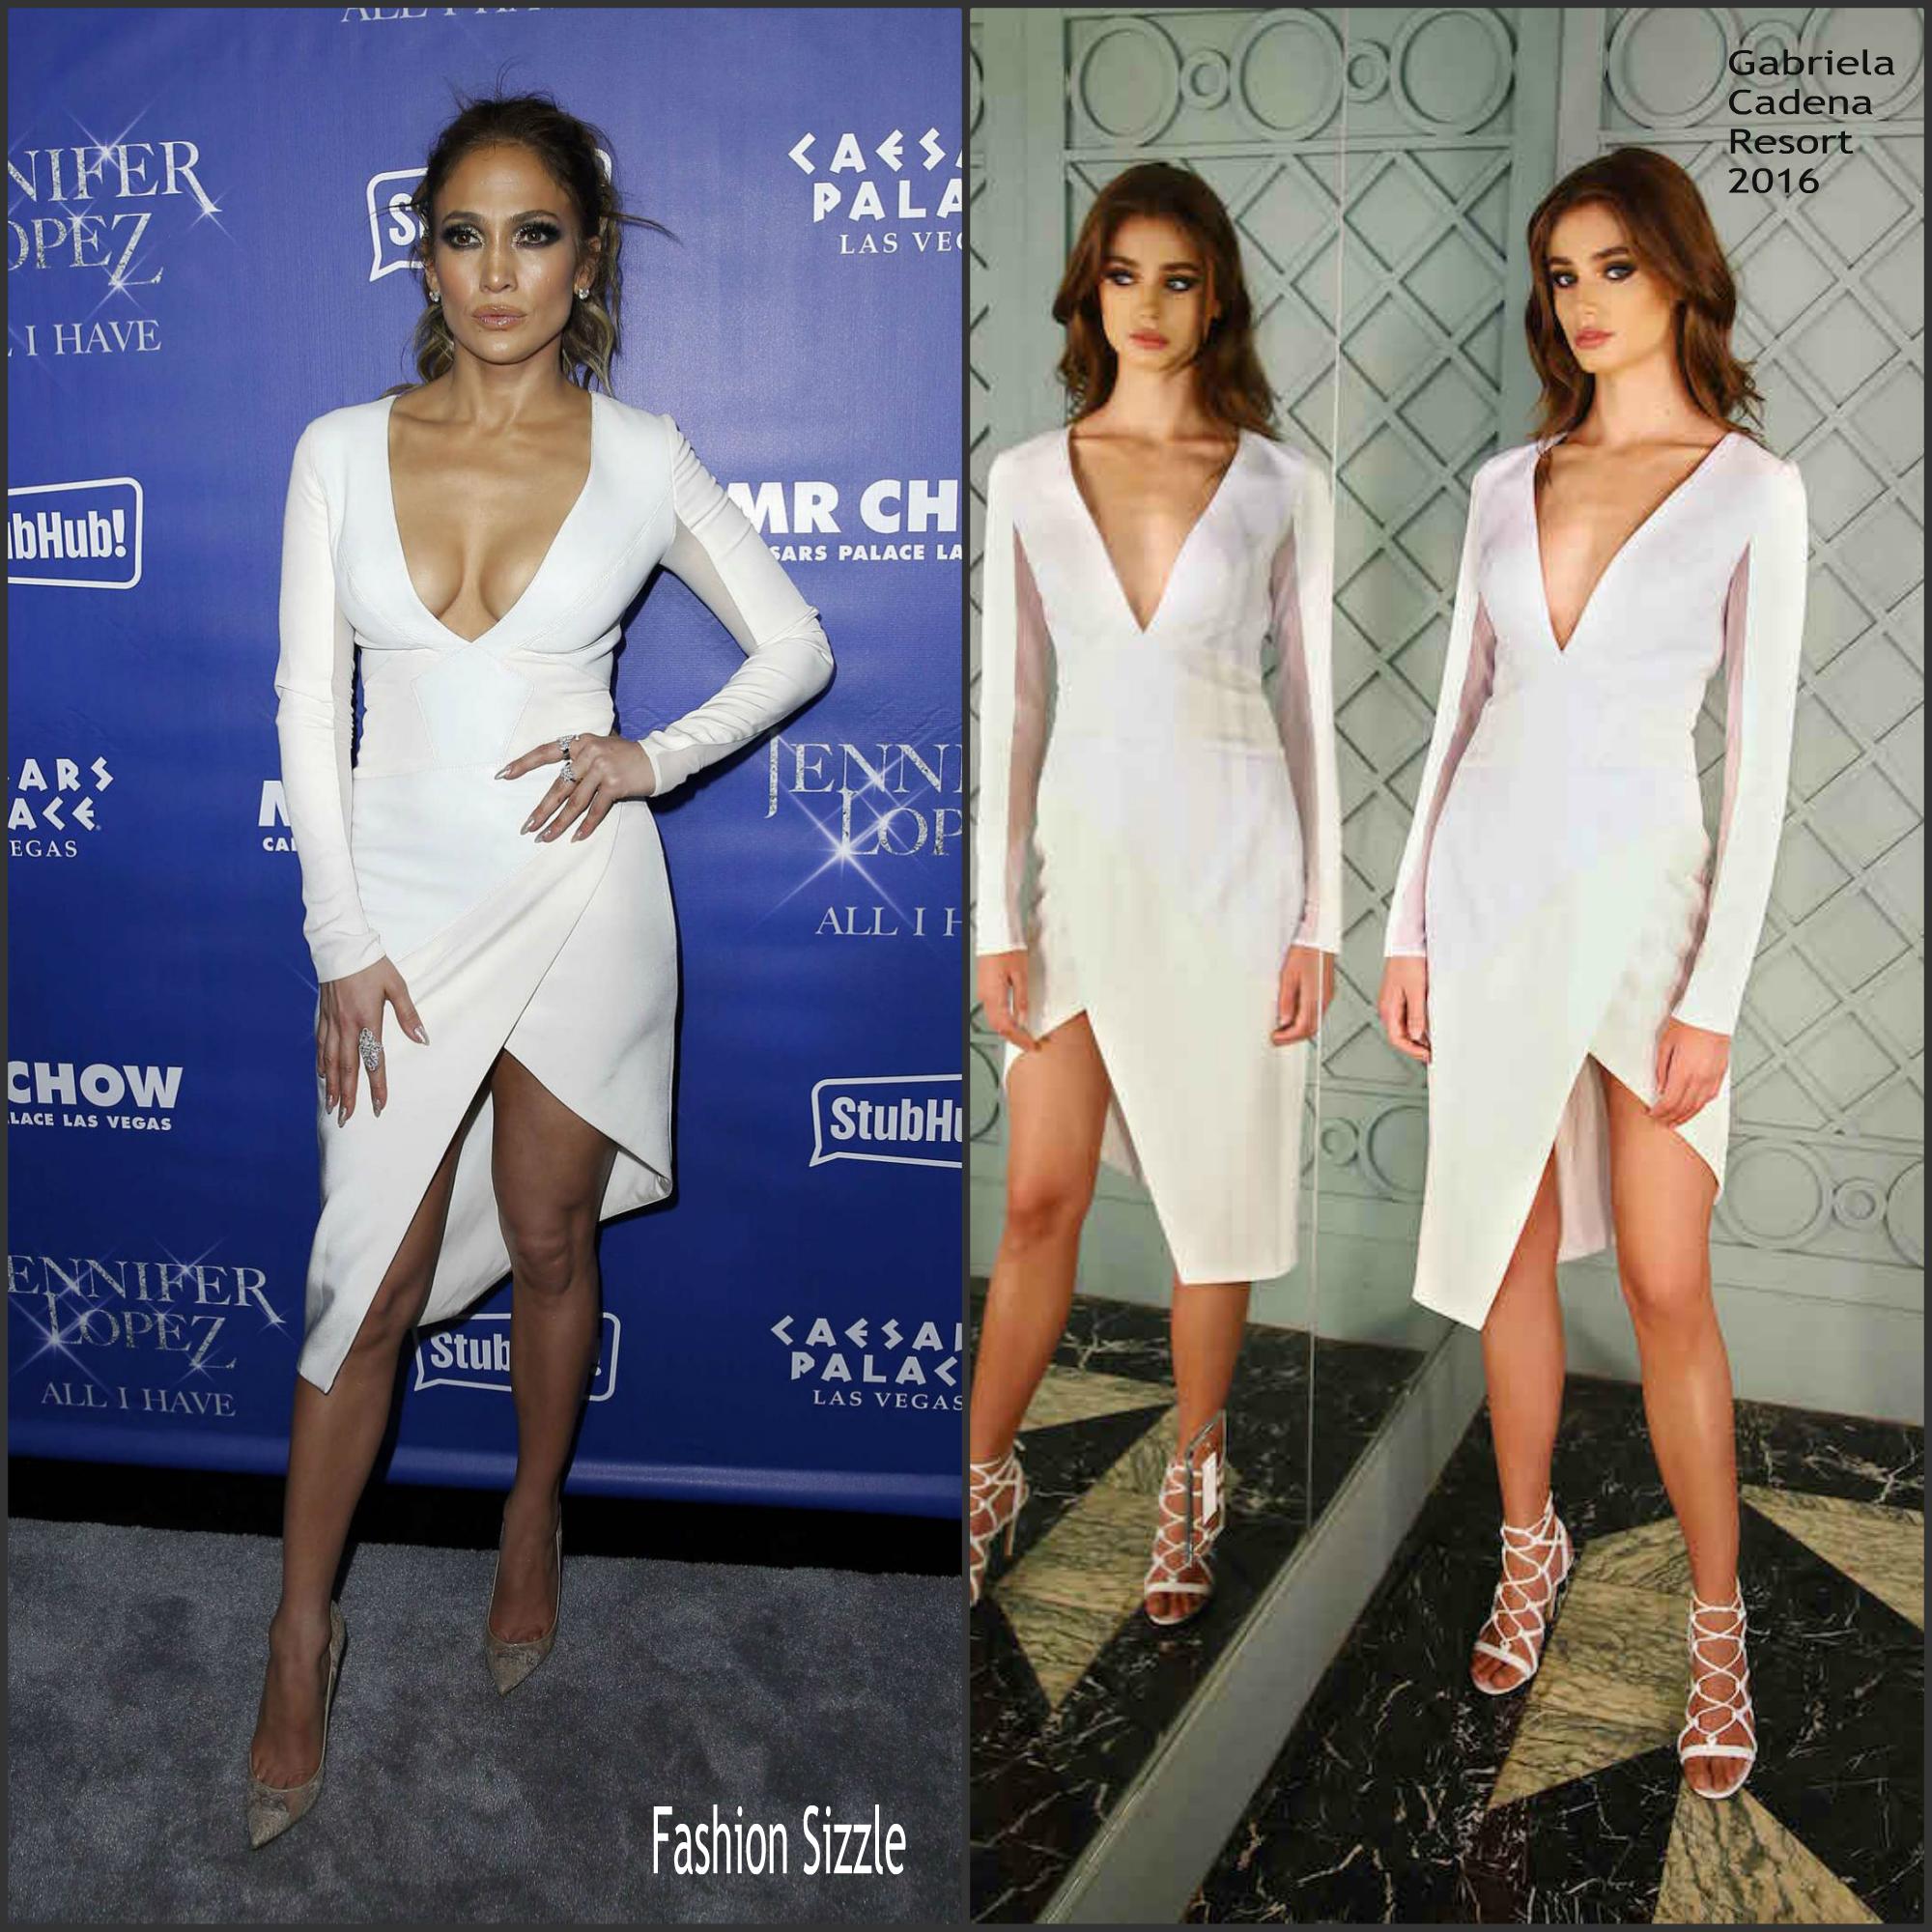 Jennifer-Lopez-in-gabriela-cadena-all-i-have-residency-afterparty-in-vegas (1)